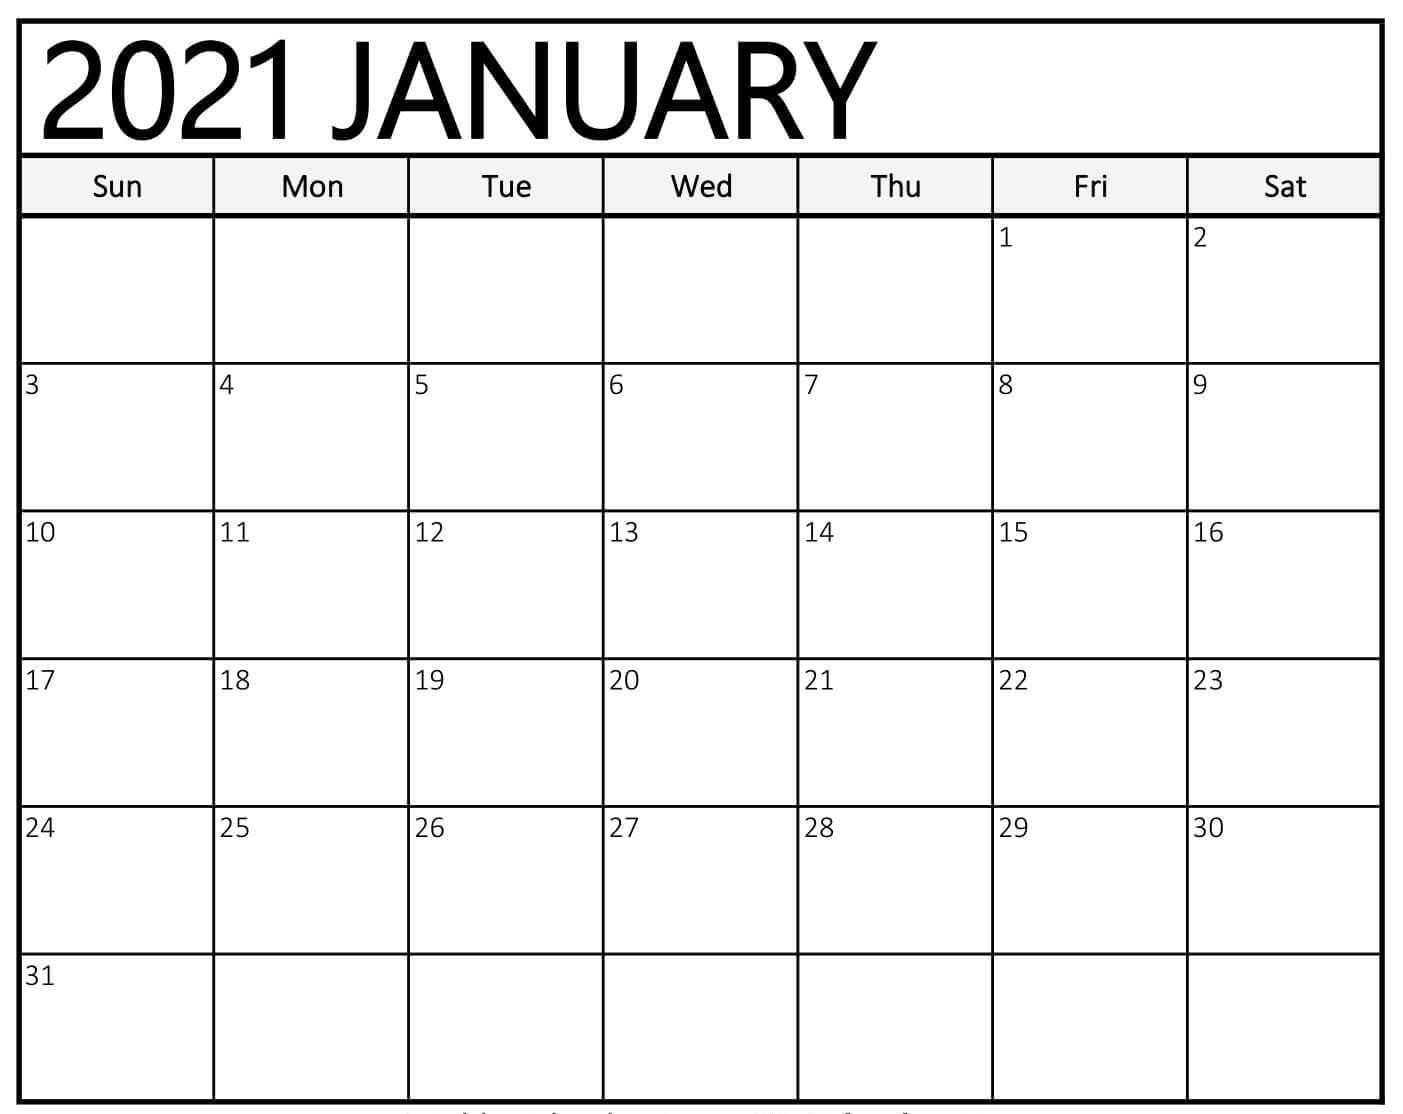 January 2021 Calendar Fillable